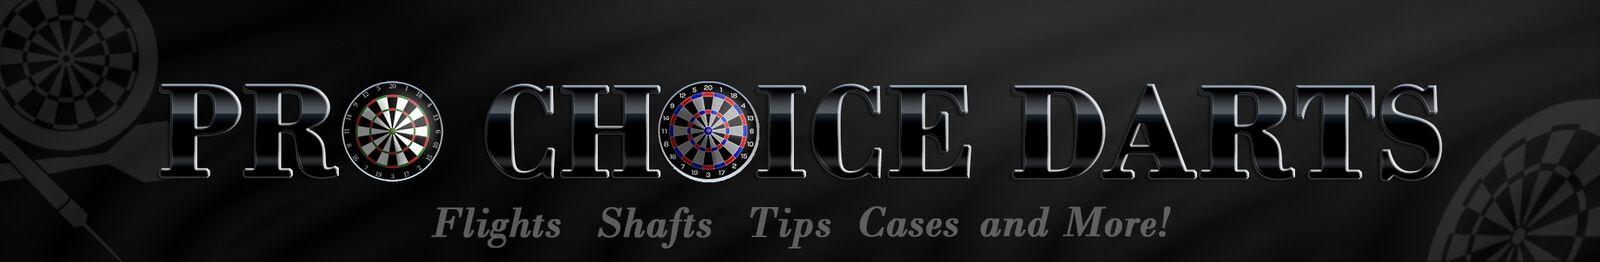 Pro Choice Darts